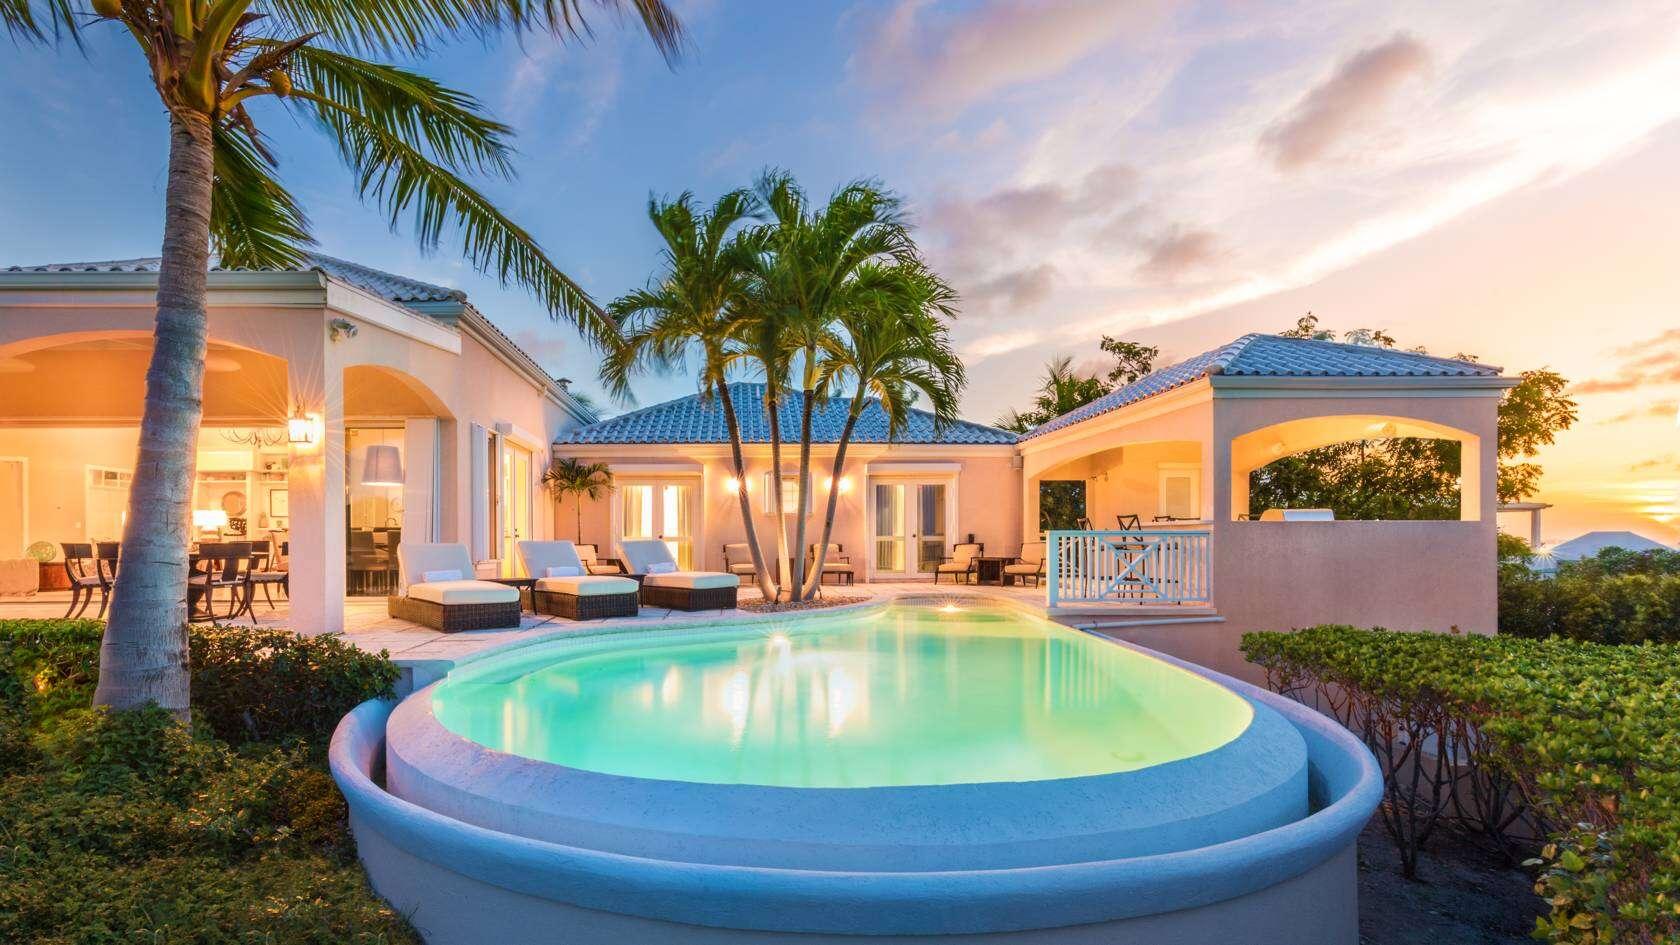 - Sea Breeze Villa - Image 1/11